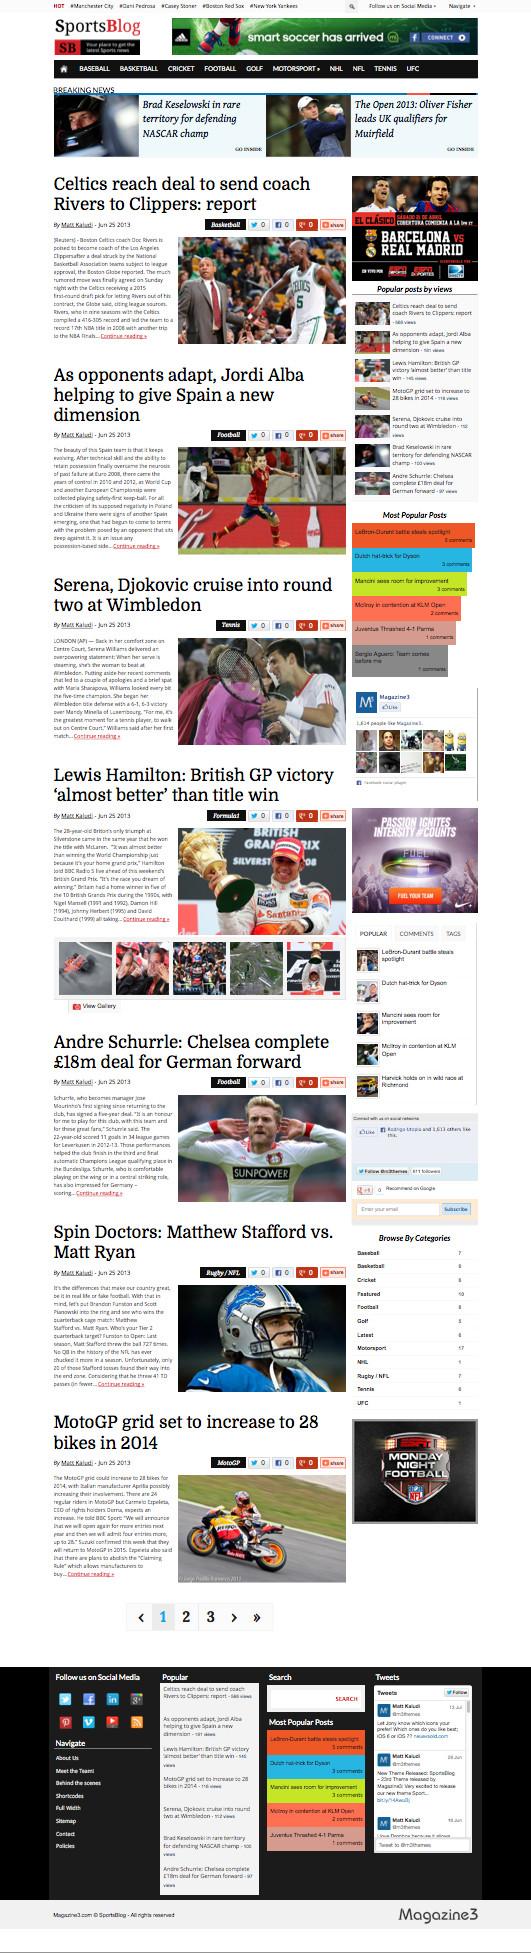 SportsBlog WordPress Sports News Blog Themem